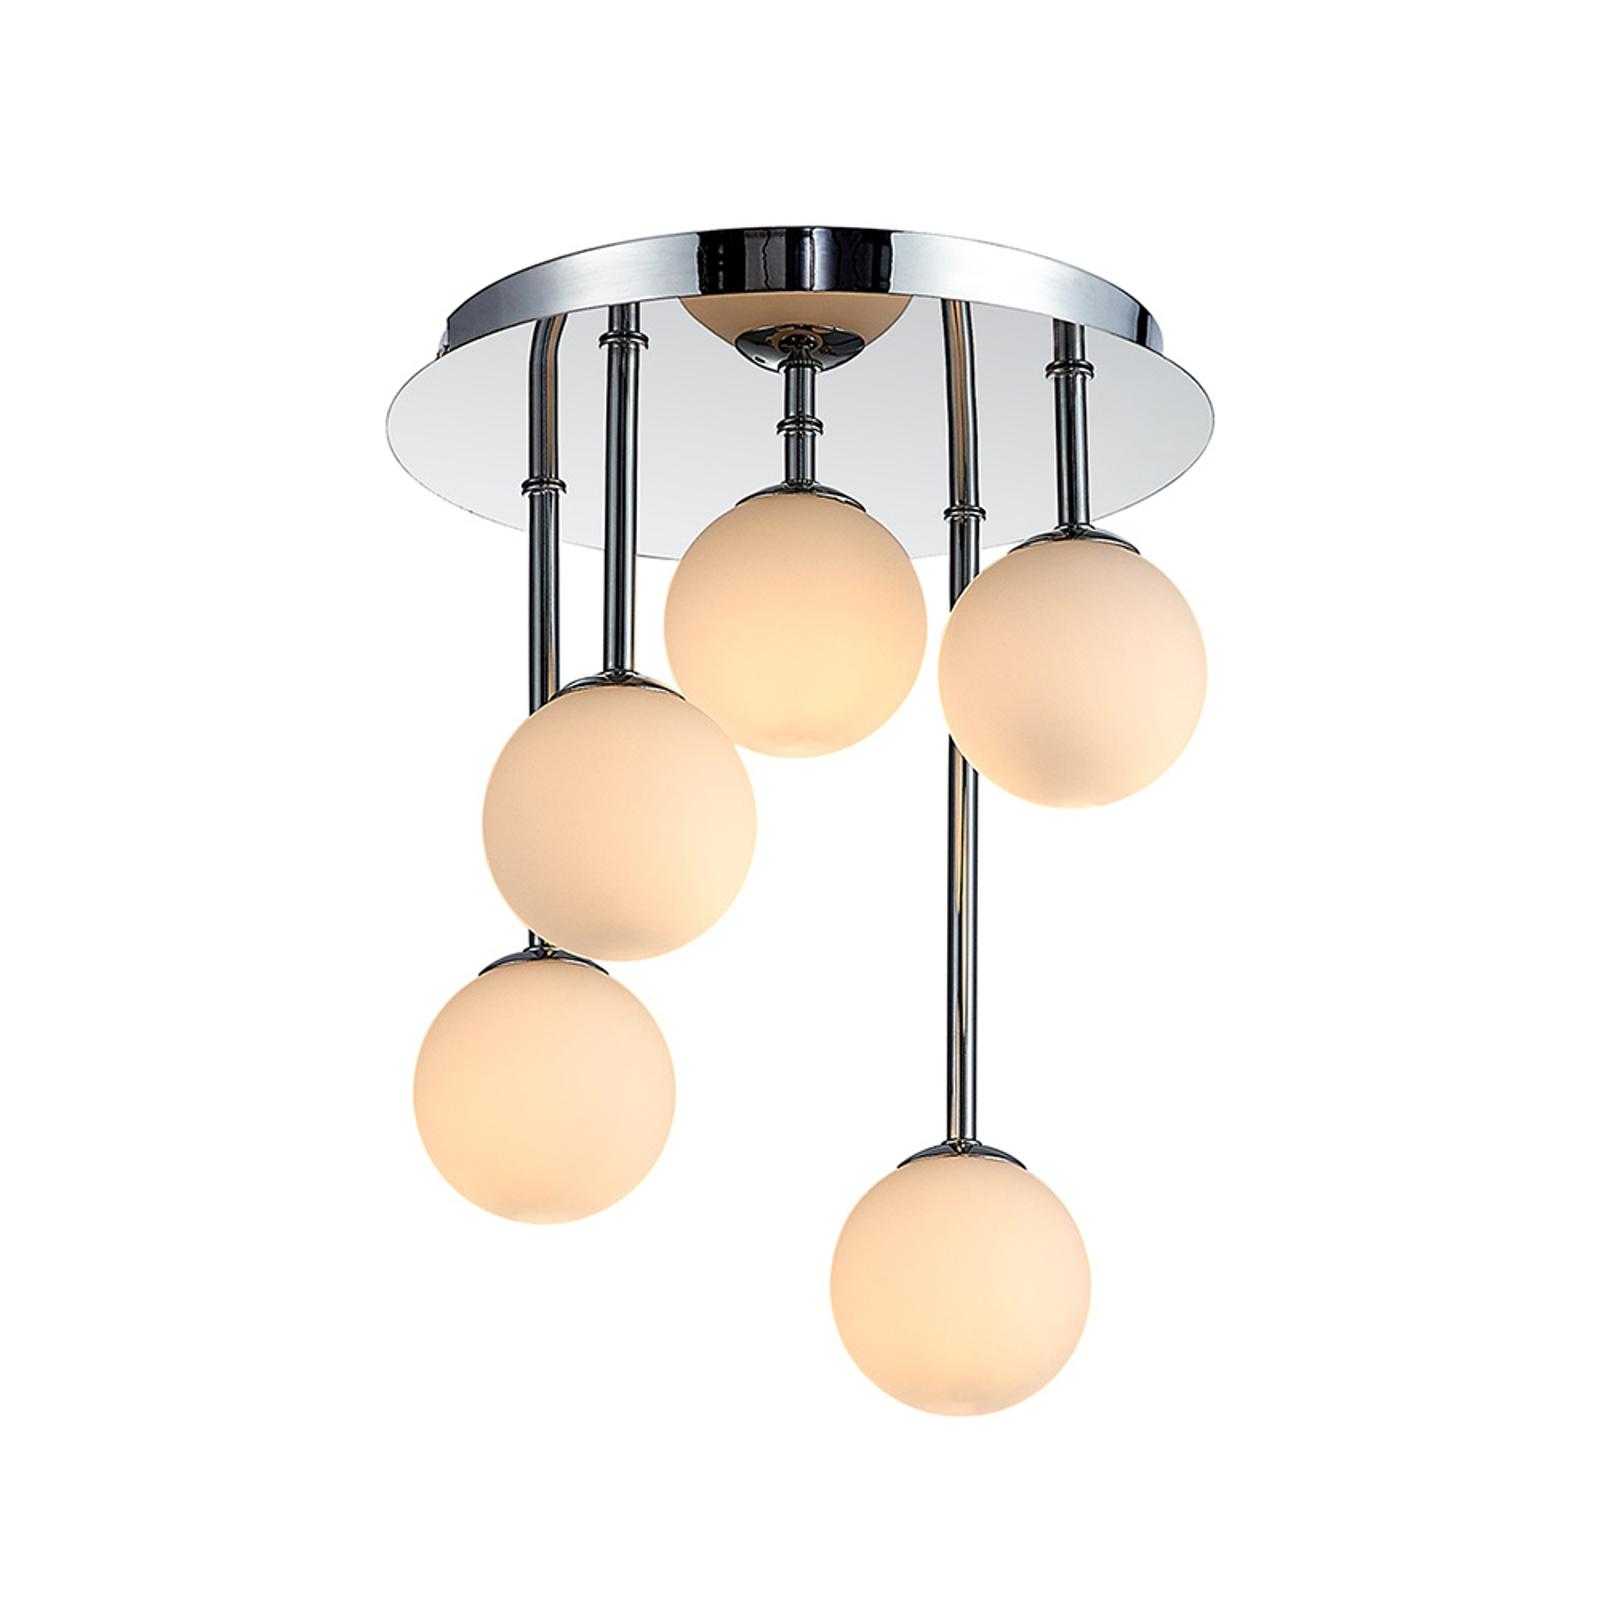 Lindby Chrissy plafondlamp, 5-lamps, 25 cm